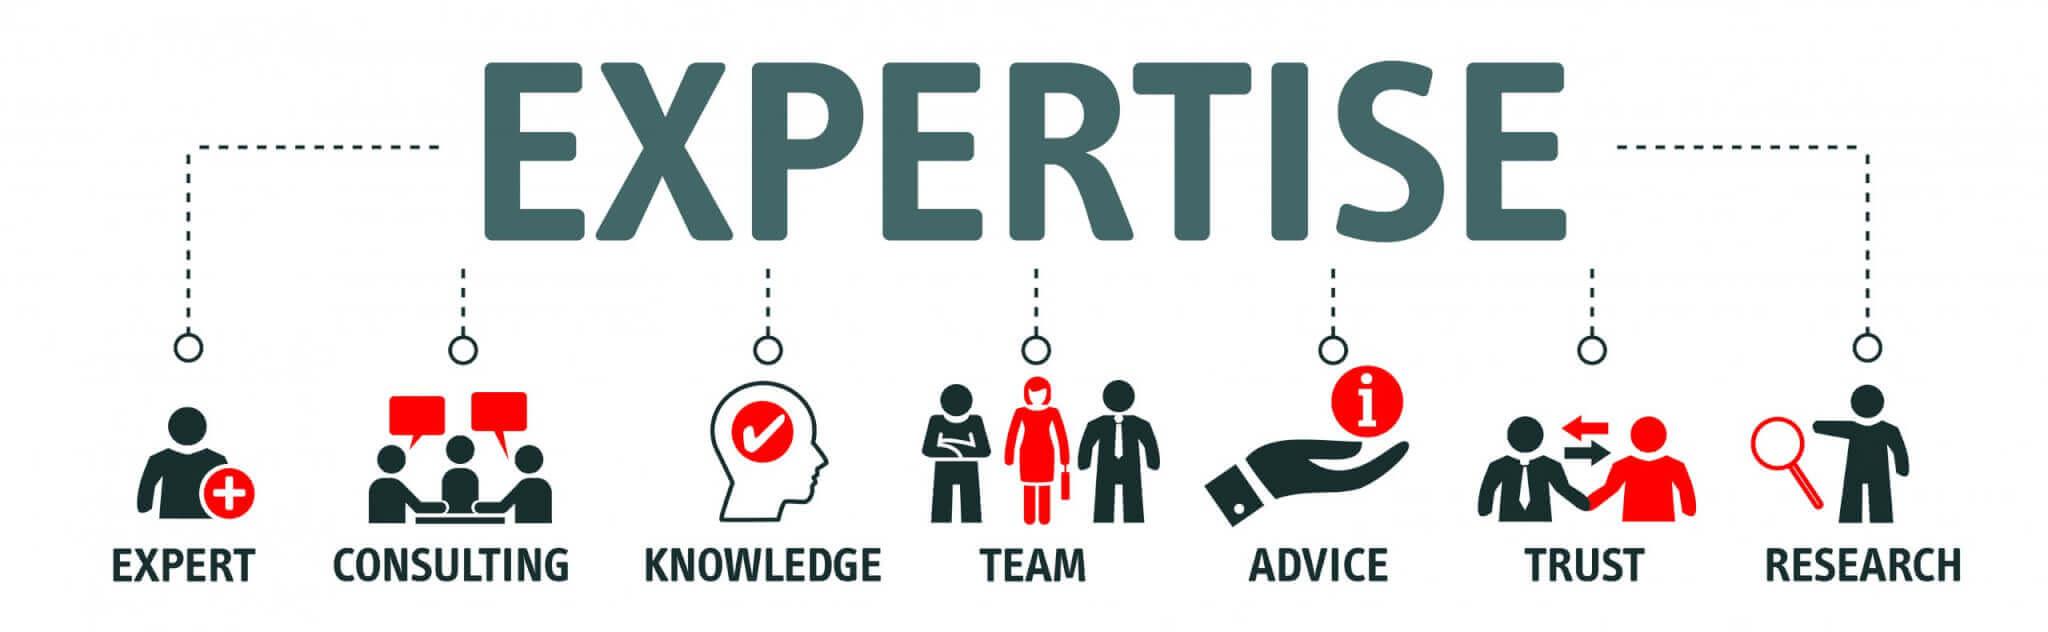 Expertise erklärt